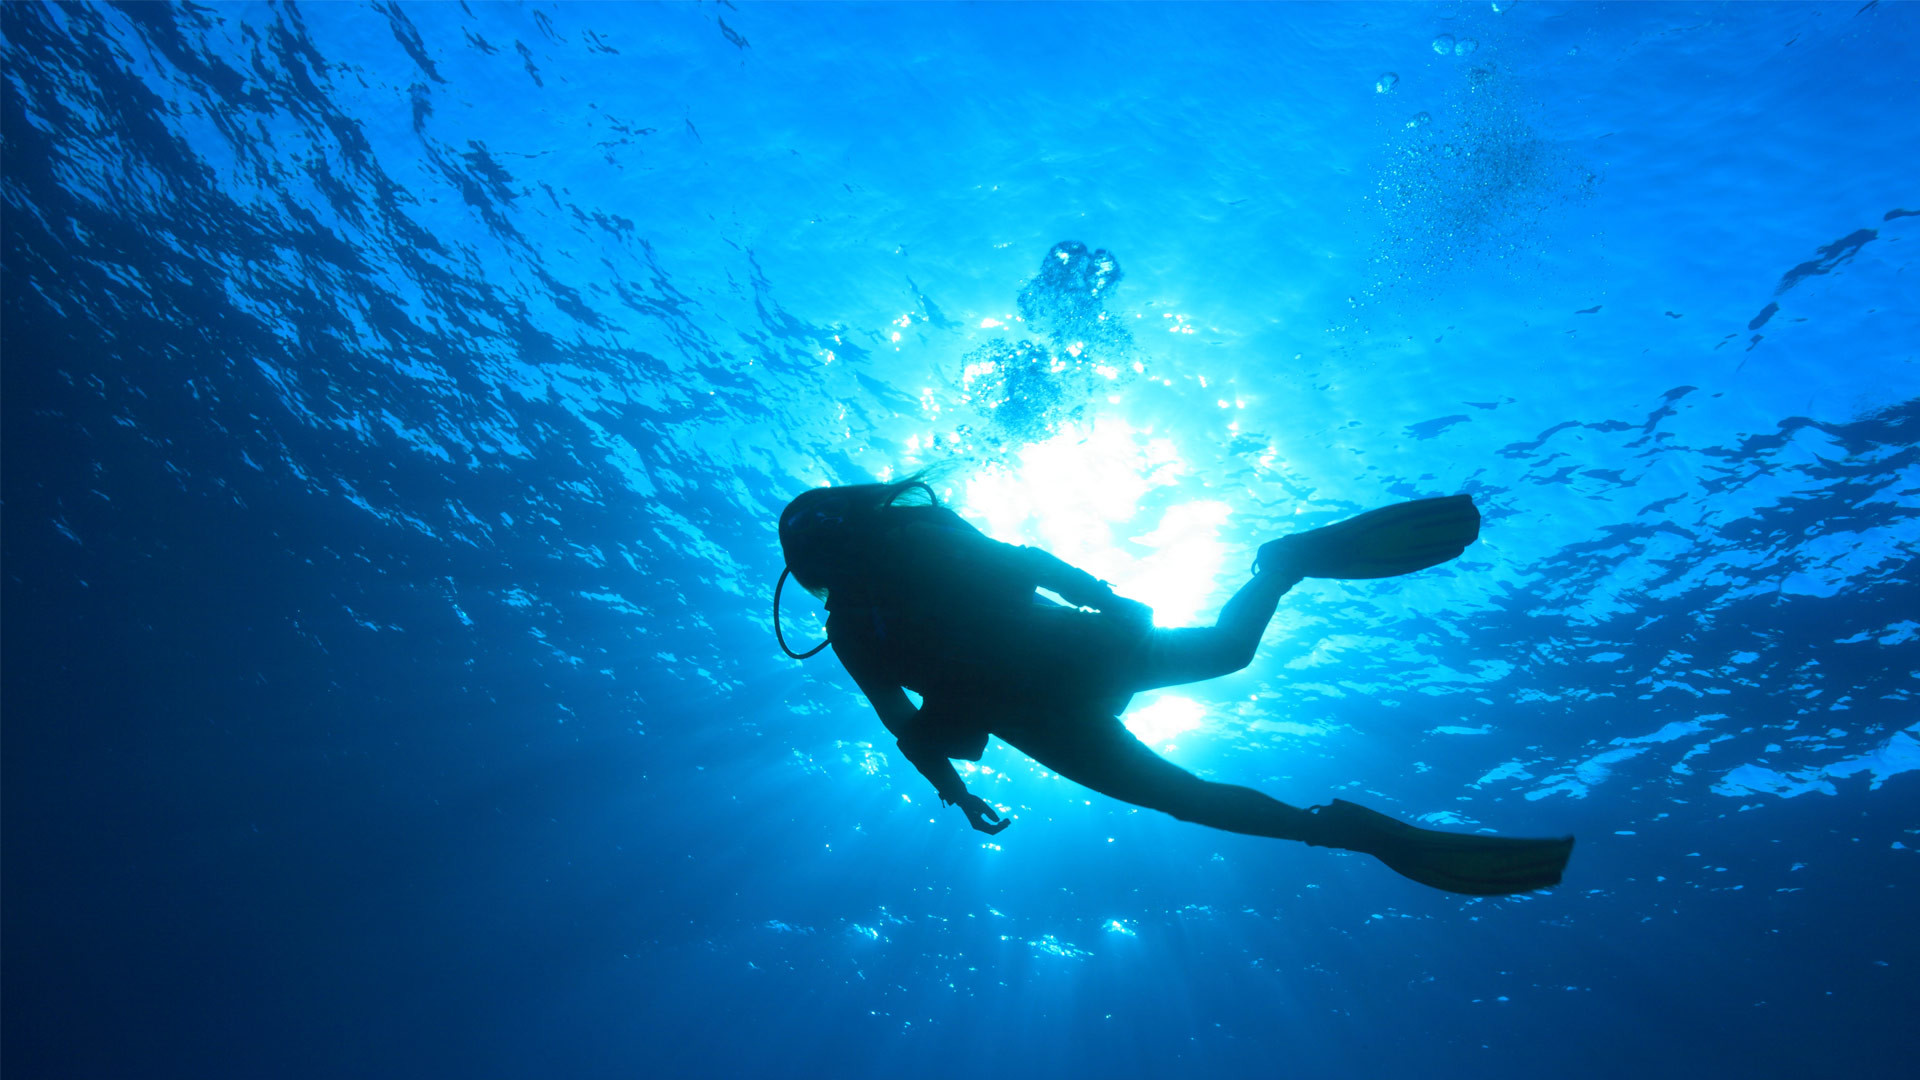 scuba diving wallpaper wallpapers - photo #18